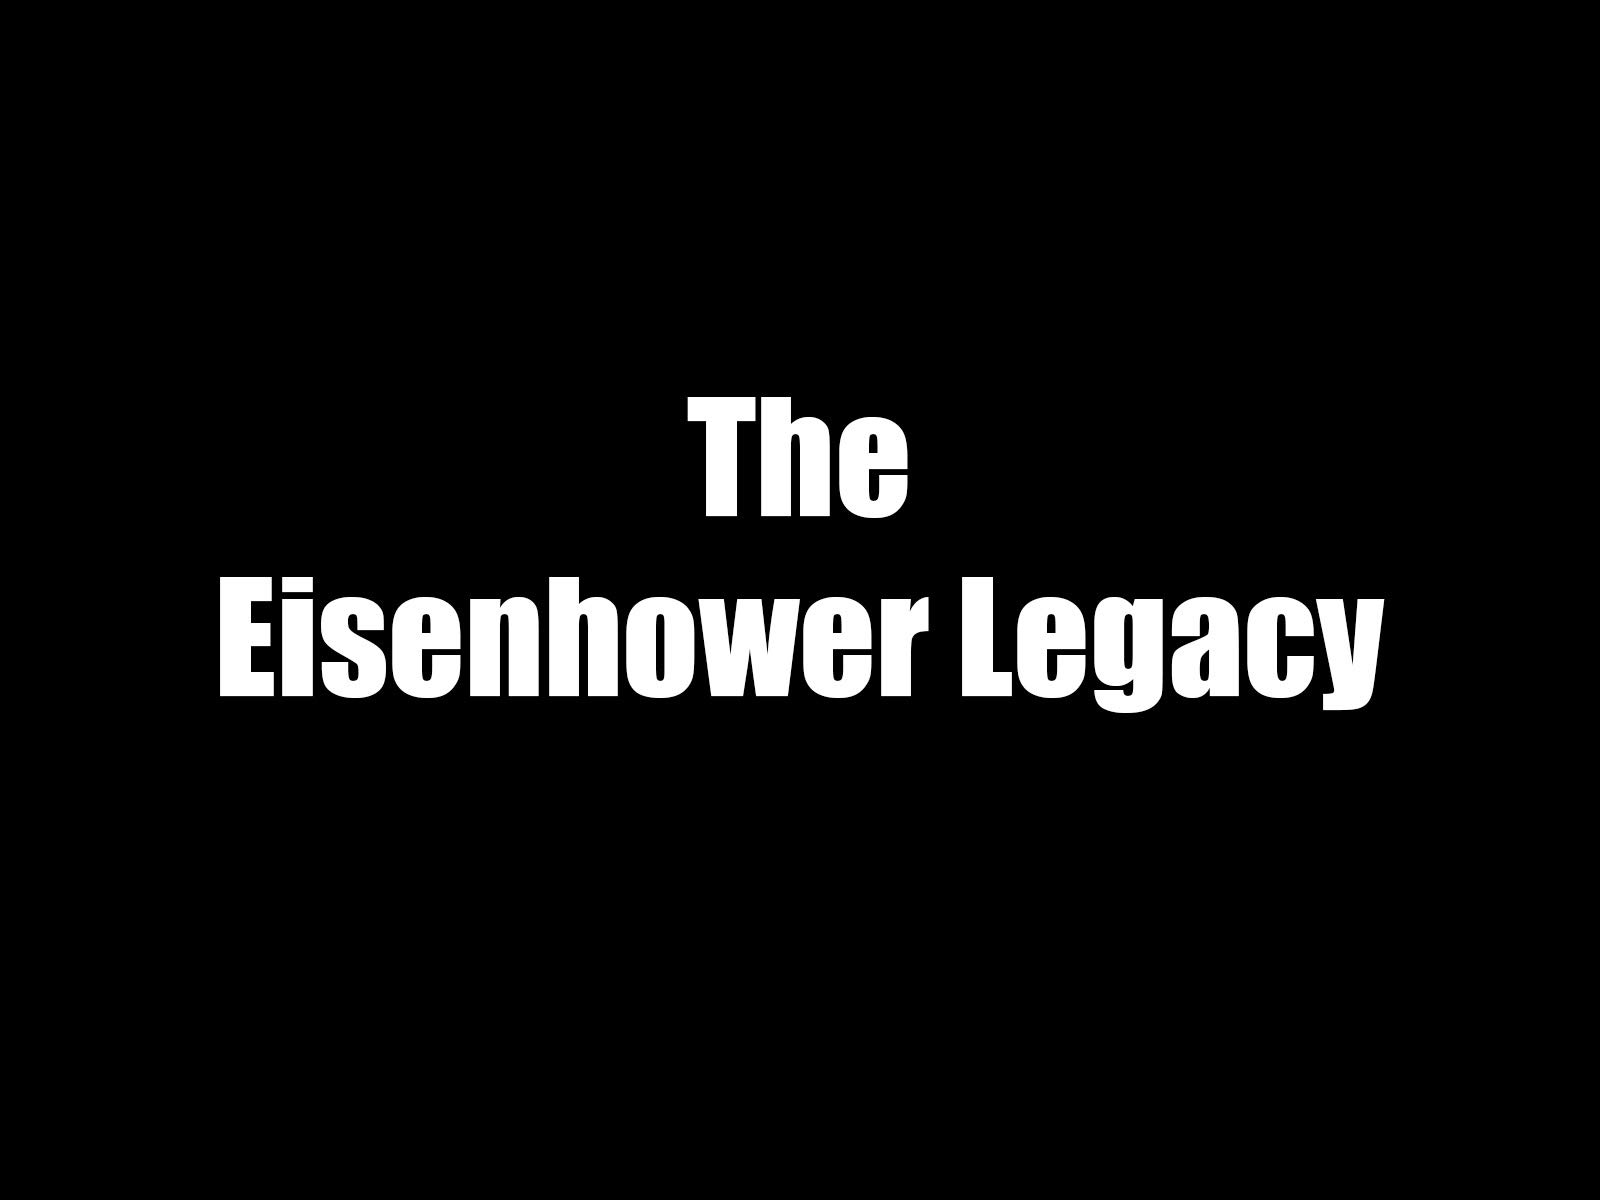 The Eisenhower Legacy